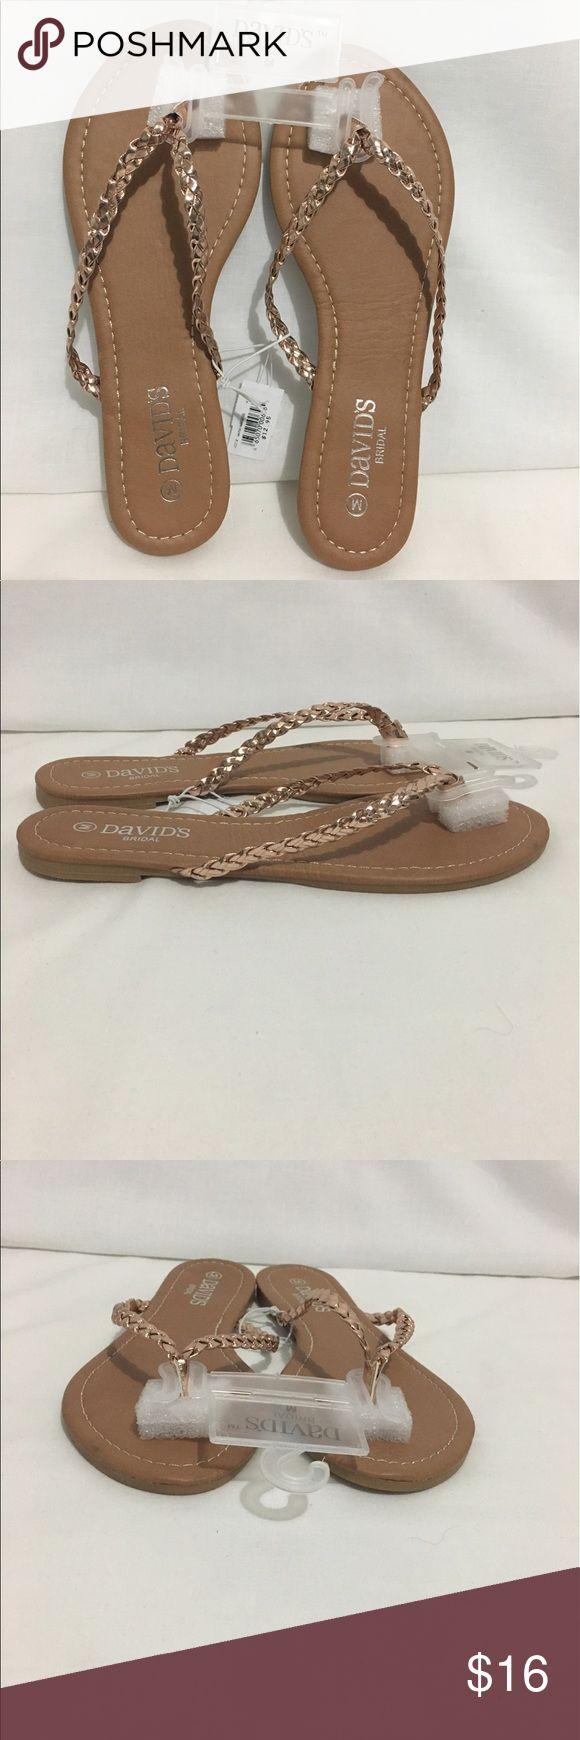 David's Bridal NWT Rose Gold Flip Flop Sandals NWT Size Medium Braided Rose Gold Sandals David's Bridal Shoes Sandals